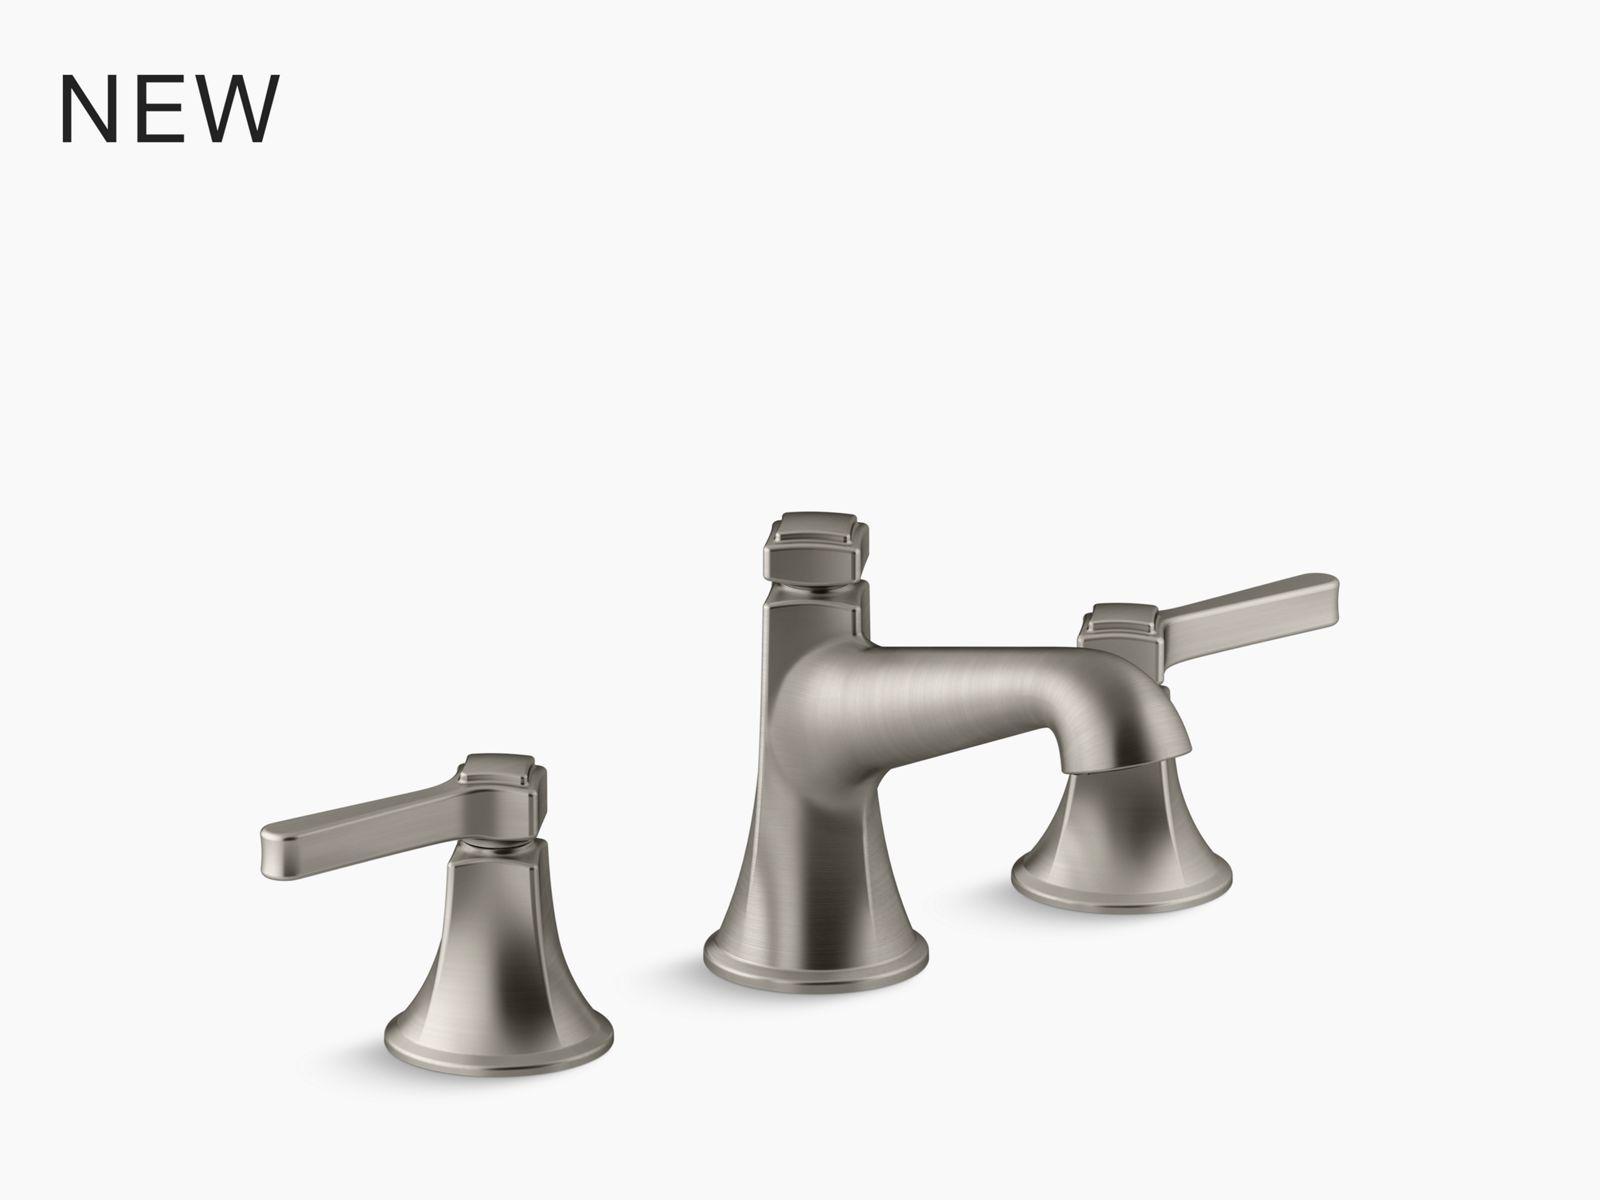 kennon 25 x 22 x 10 5 8 neoroc top mount undermount single bowl kitchen sink